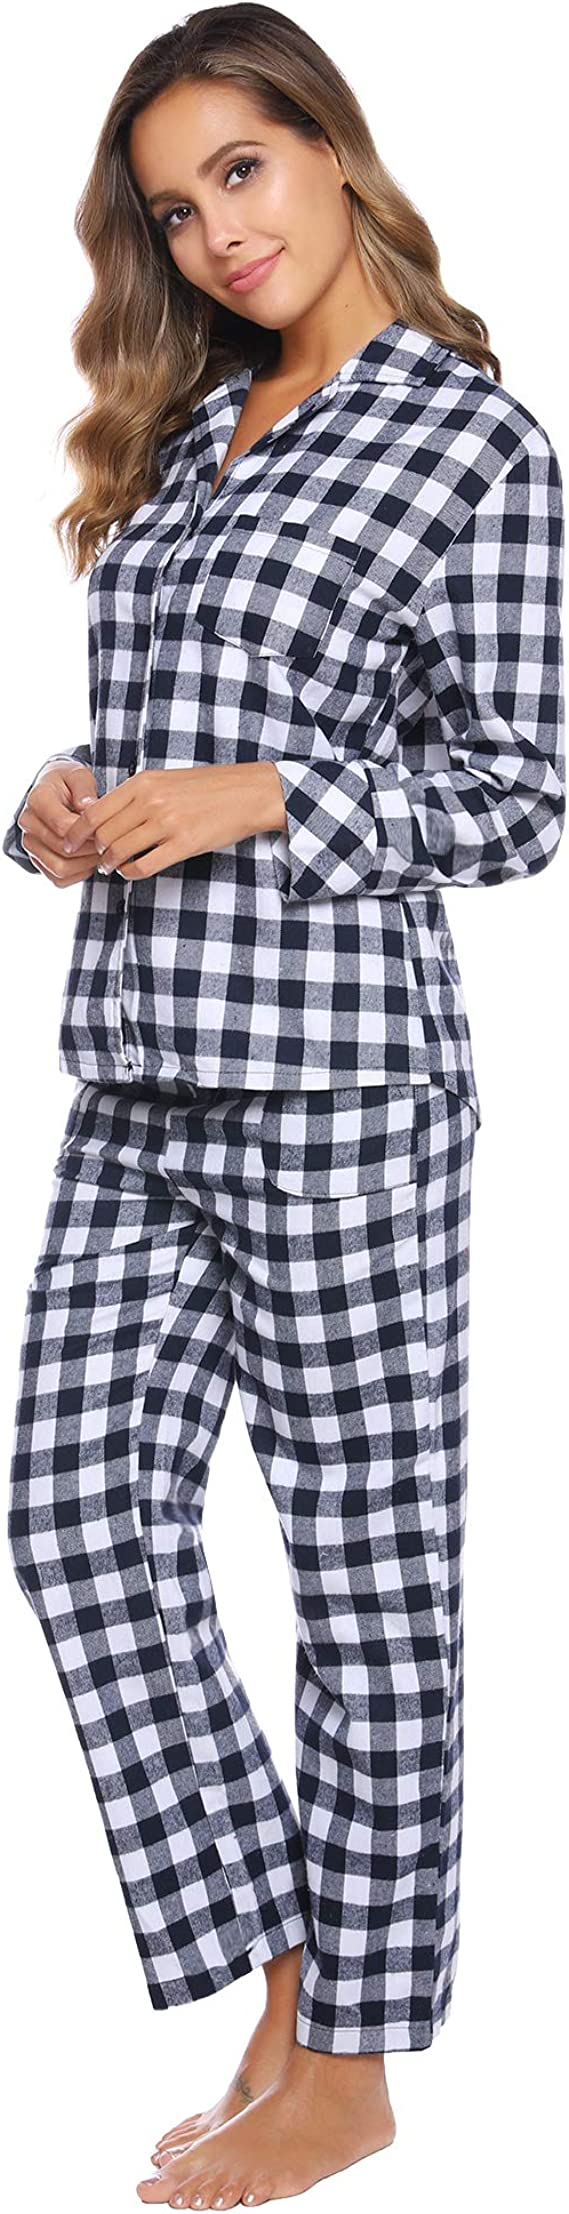 Mode Simple Style Classique PyjamaEnsemble de Pyjama en Flanelle Aibrou Pyjama Femmes Hiver